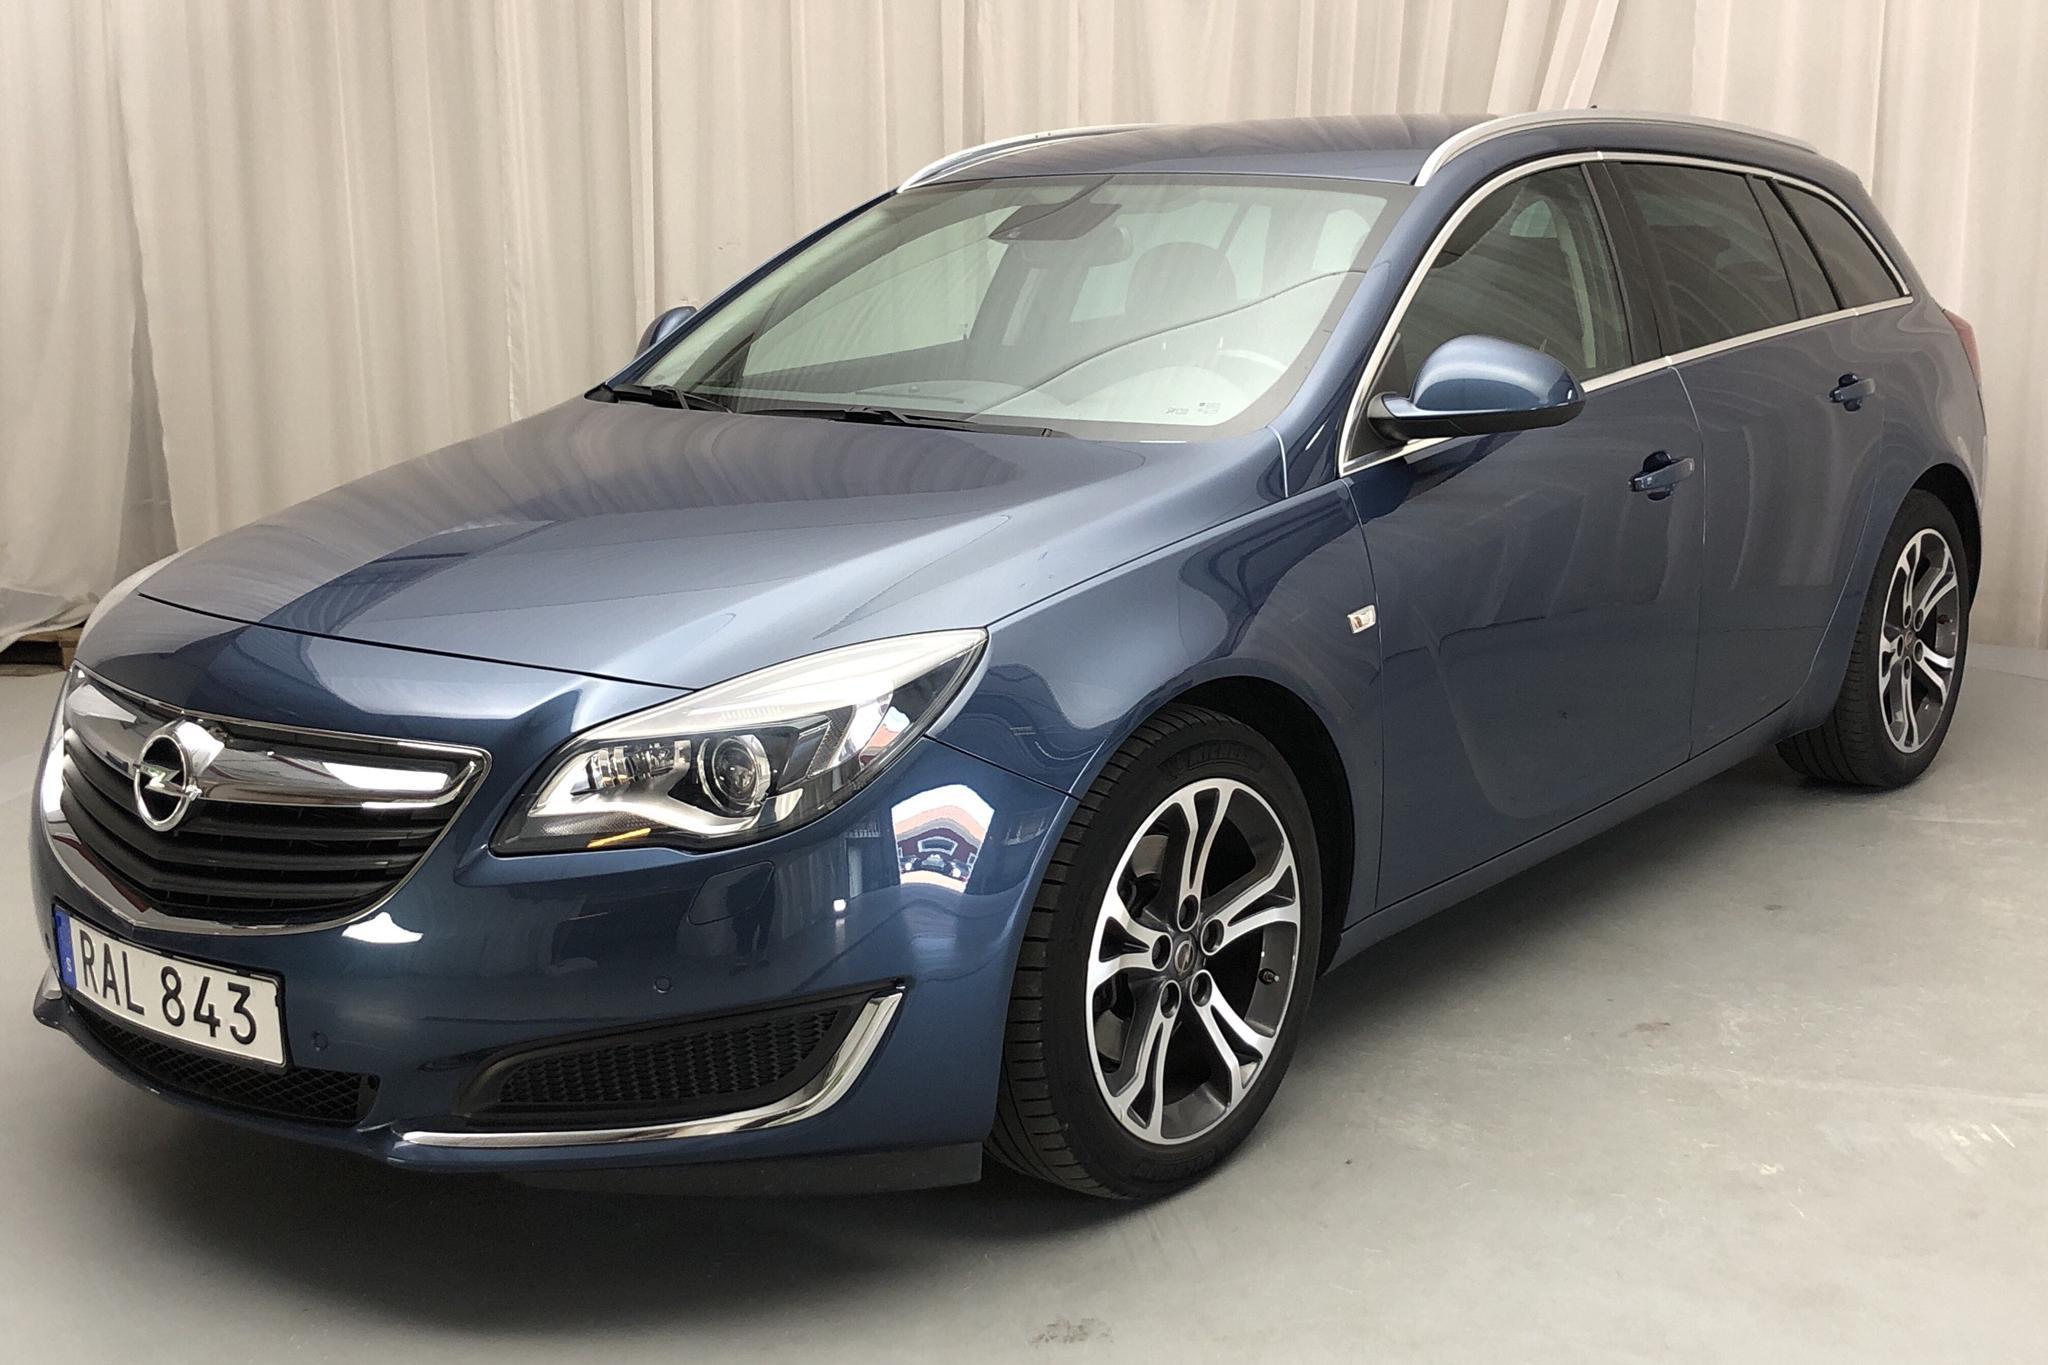 Opel Insignia 2.0 CDTI ECOTEC Sports Tourer (170hk) - 7 861 mil - Manuell - blå - 2016